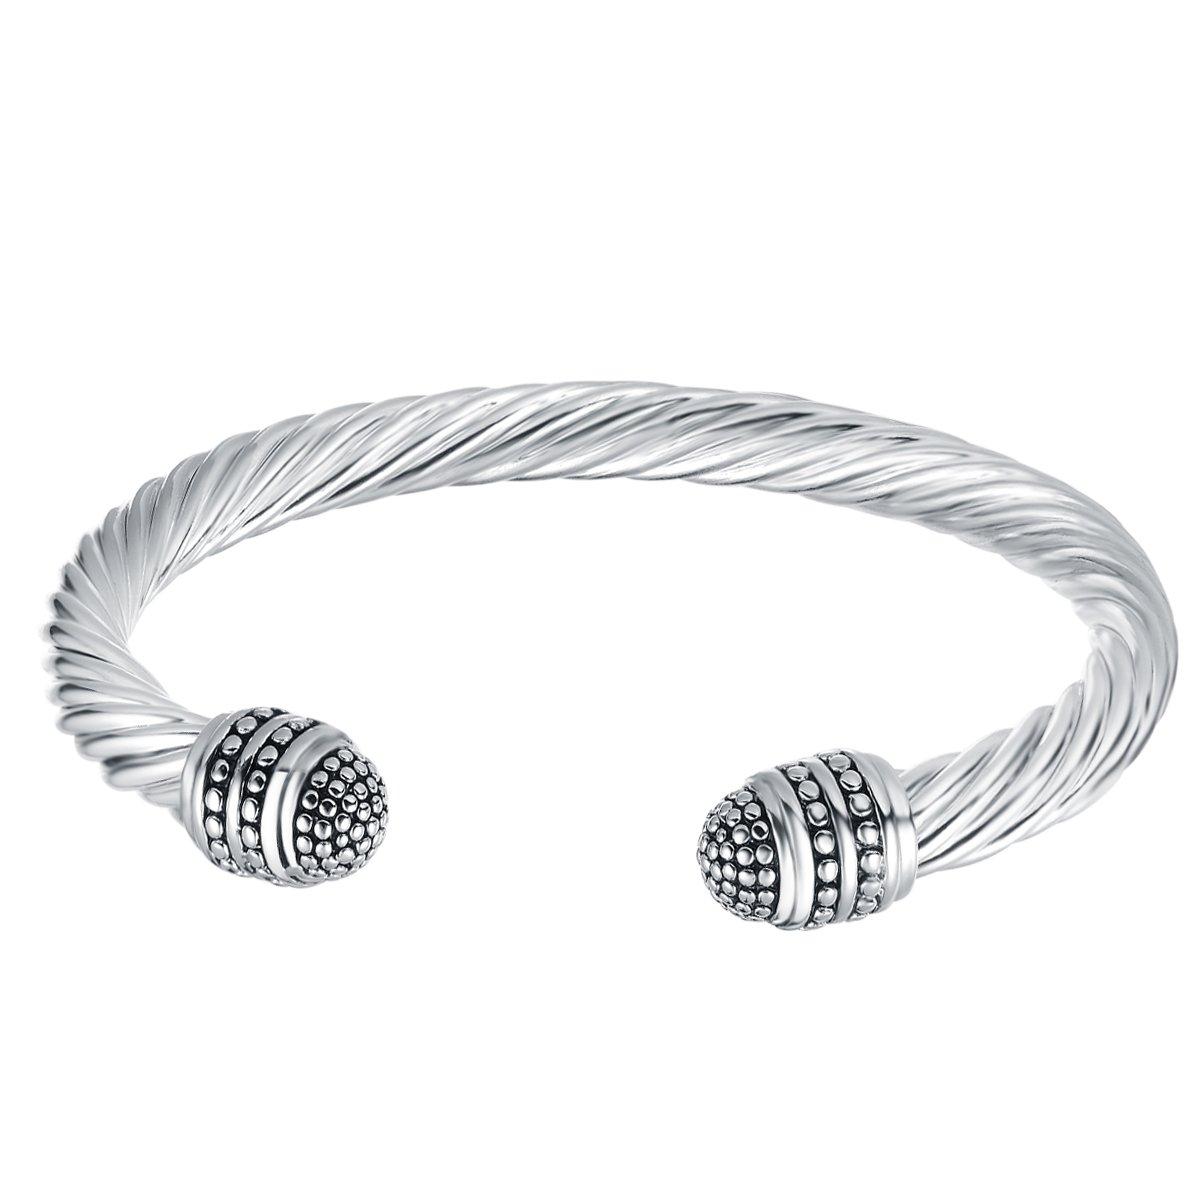 UNY Fashion Jewelry Brand Cable Wire Retro Antique Bangle Elegant Beautiful Valentine UNY17030